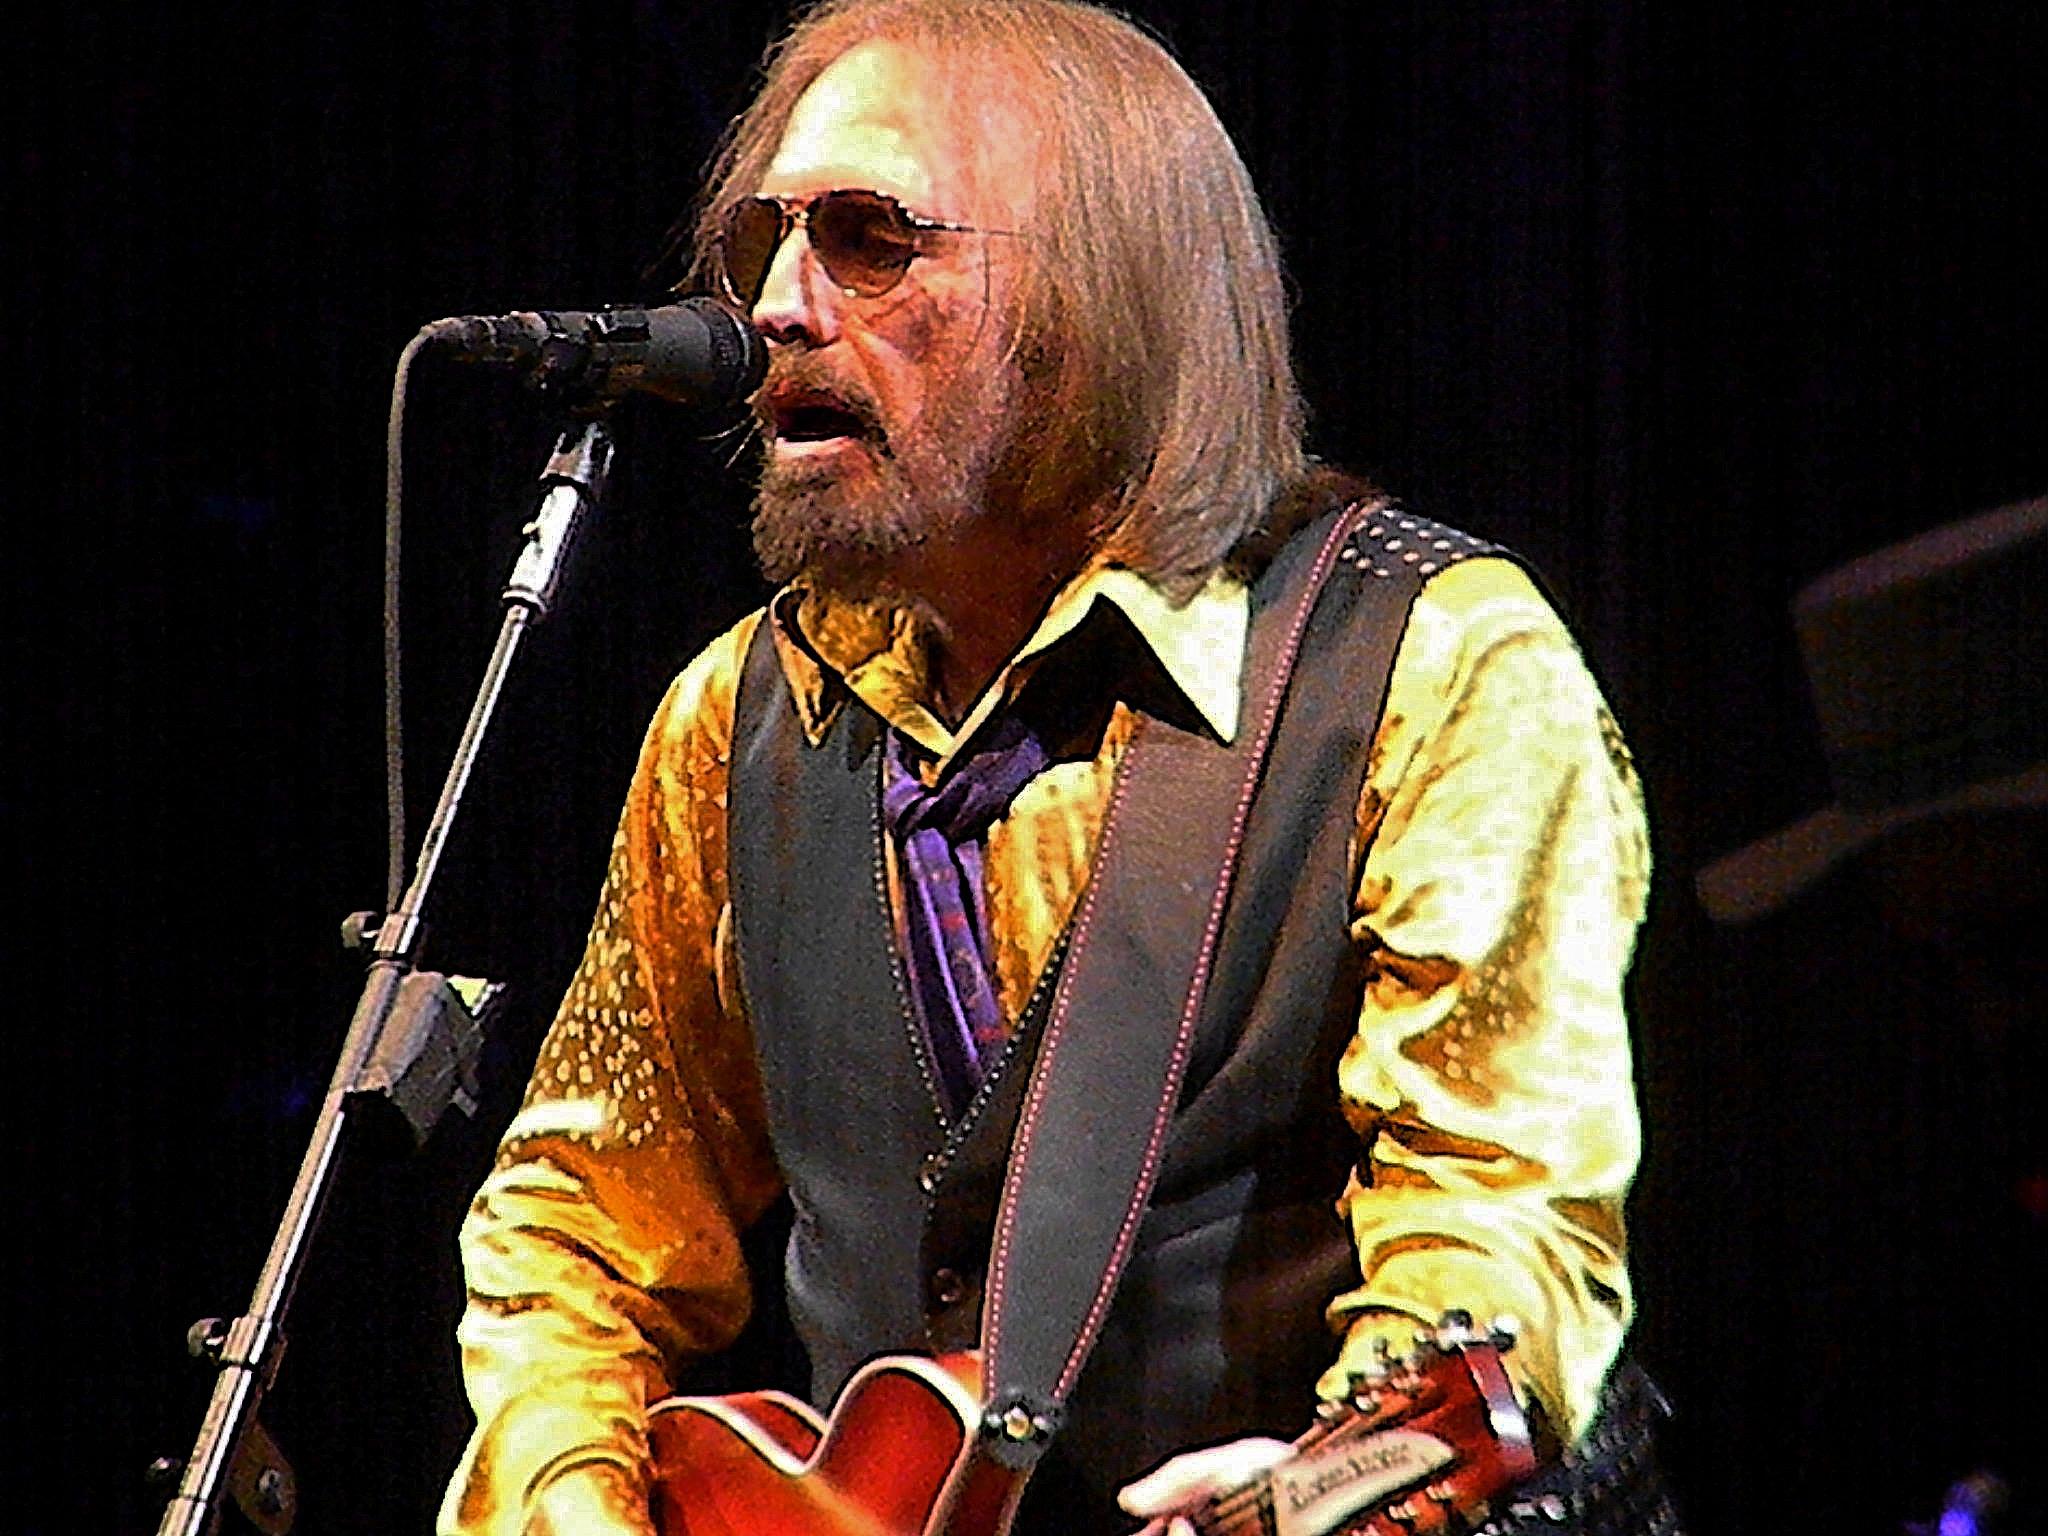 Tom Petty's 70th Birthday